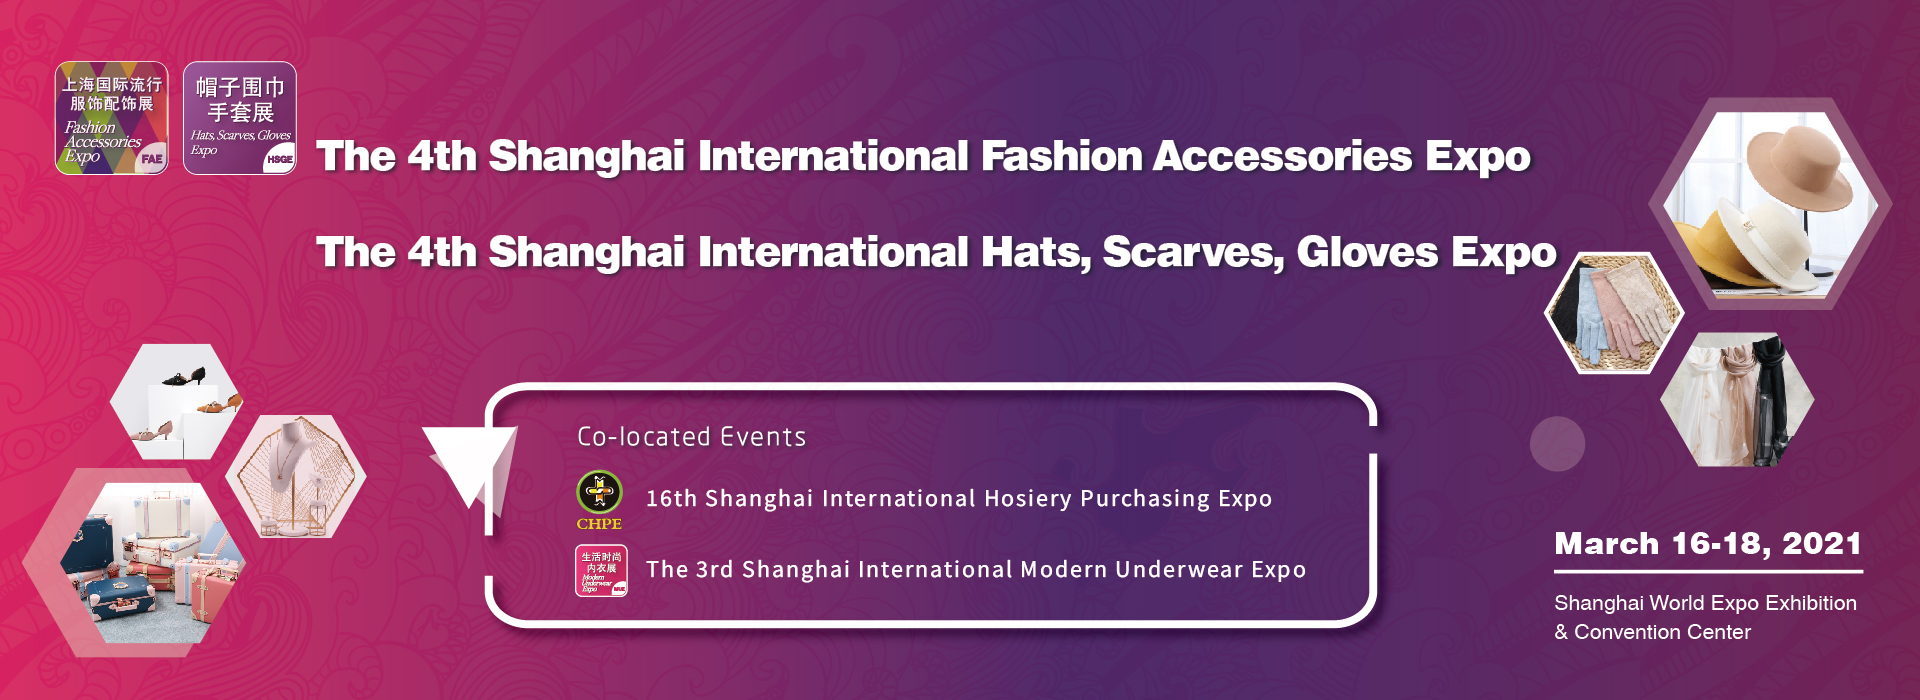 FAE – Shanghai International Fashion Accessories Expo